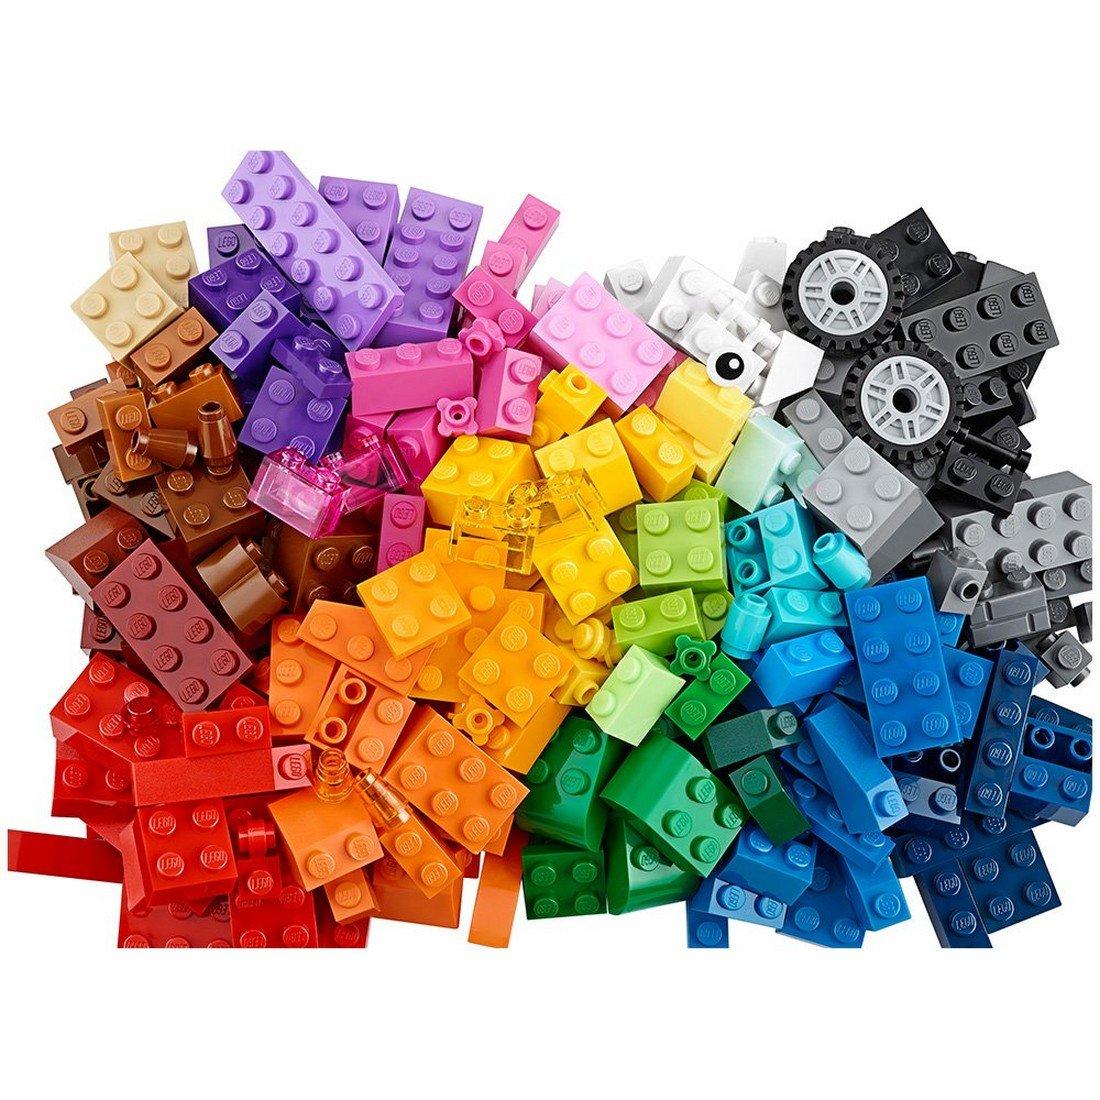 Classic Lego Creative Building Box Set #10695